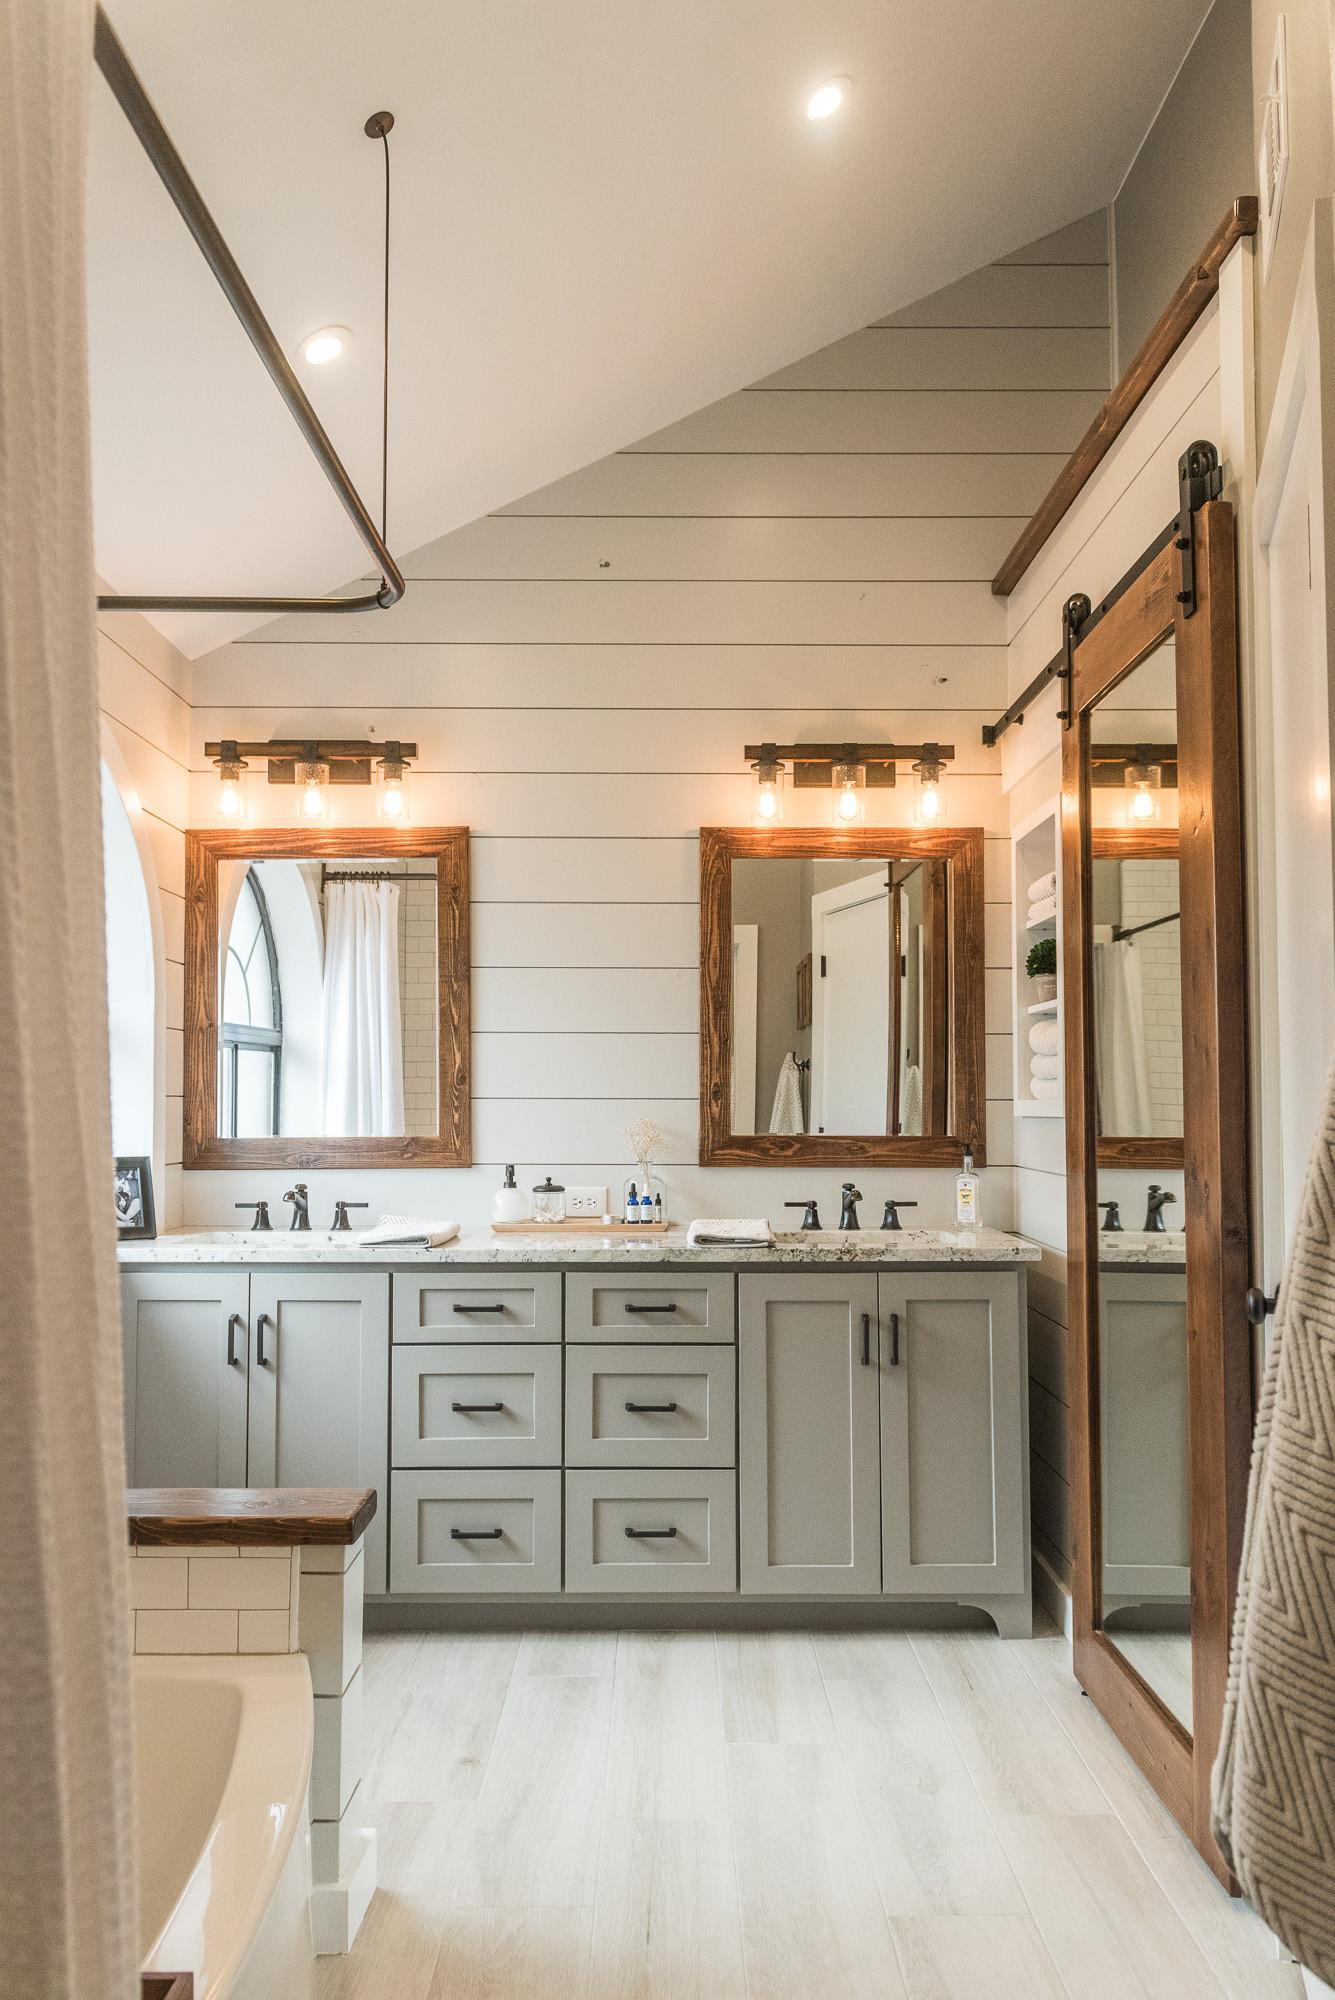 Farmhouse Master Bathroom  Modern Farmhouse Bathroom Inspiration • Jillian Lare Des